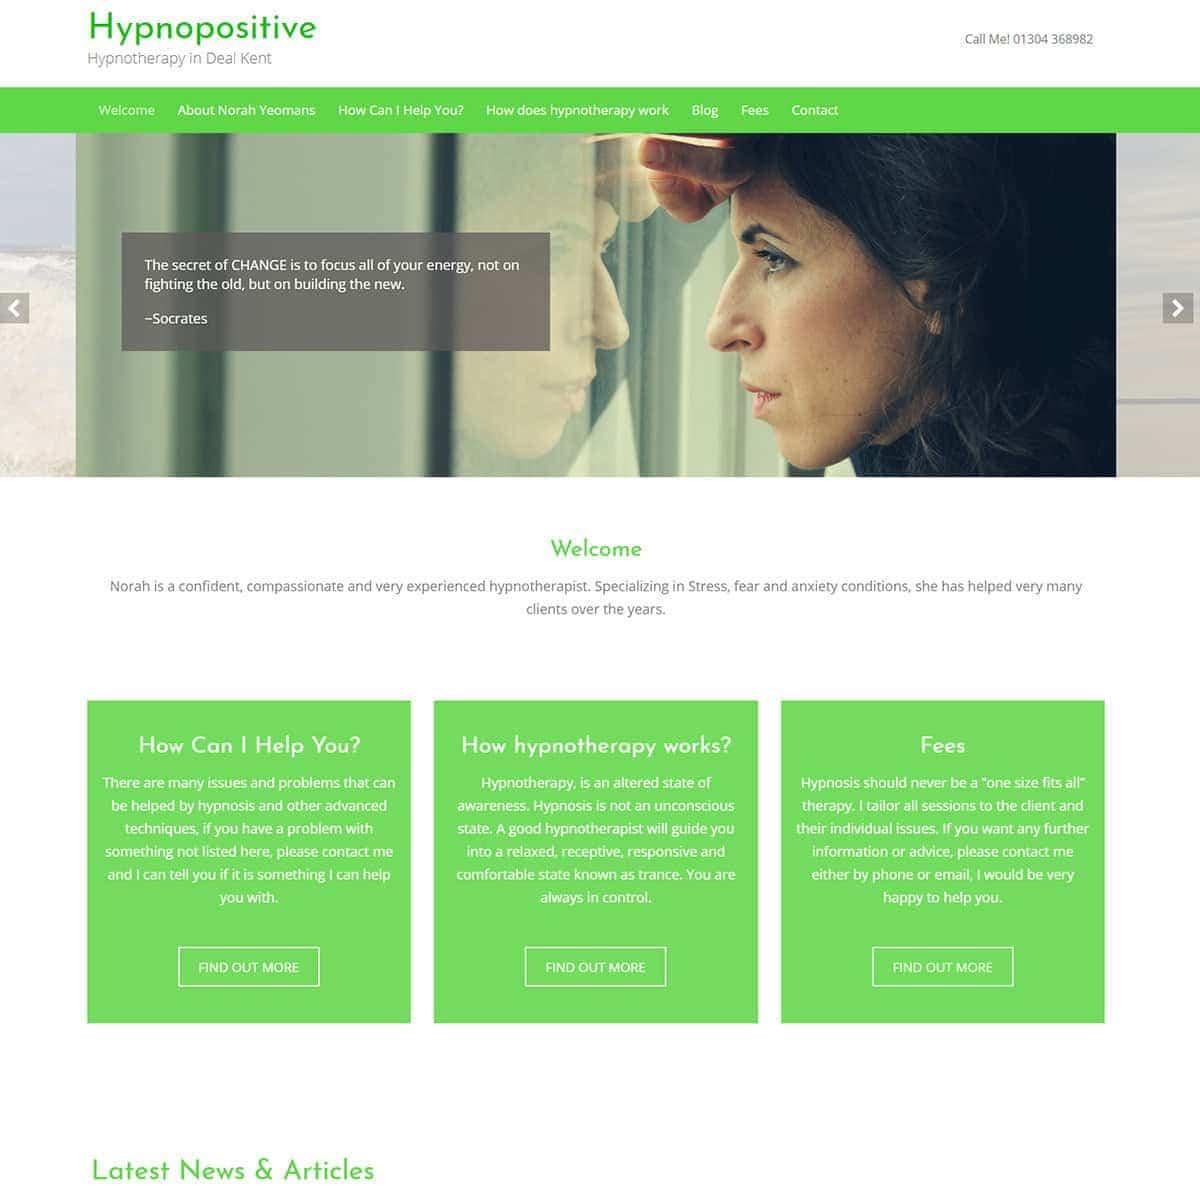 hypnopositive